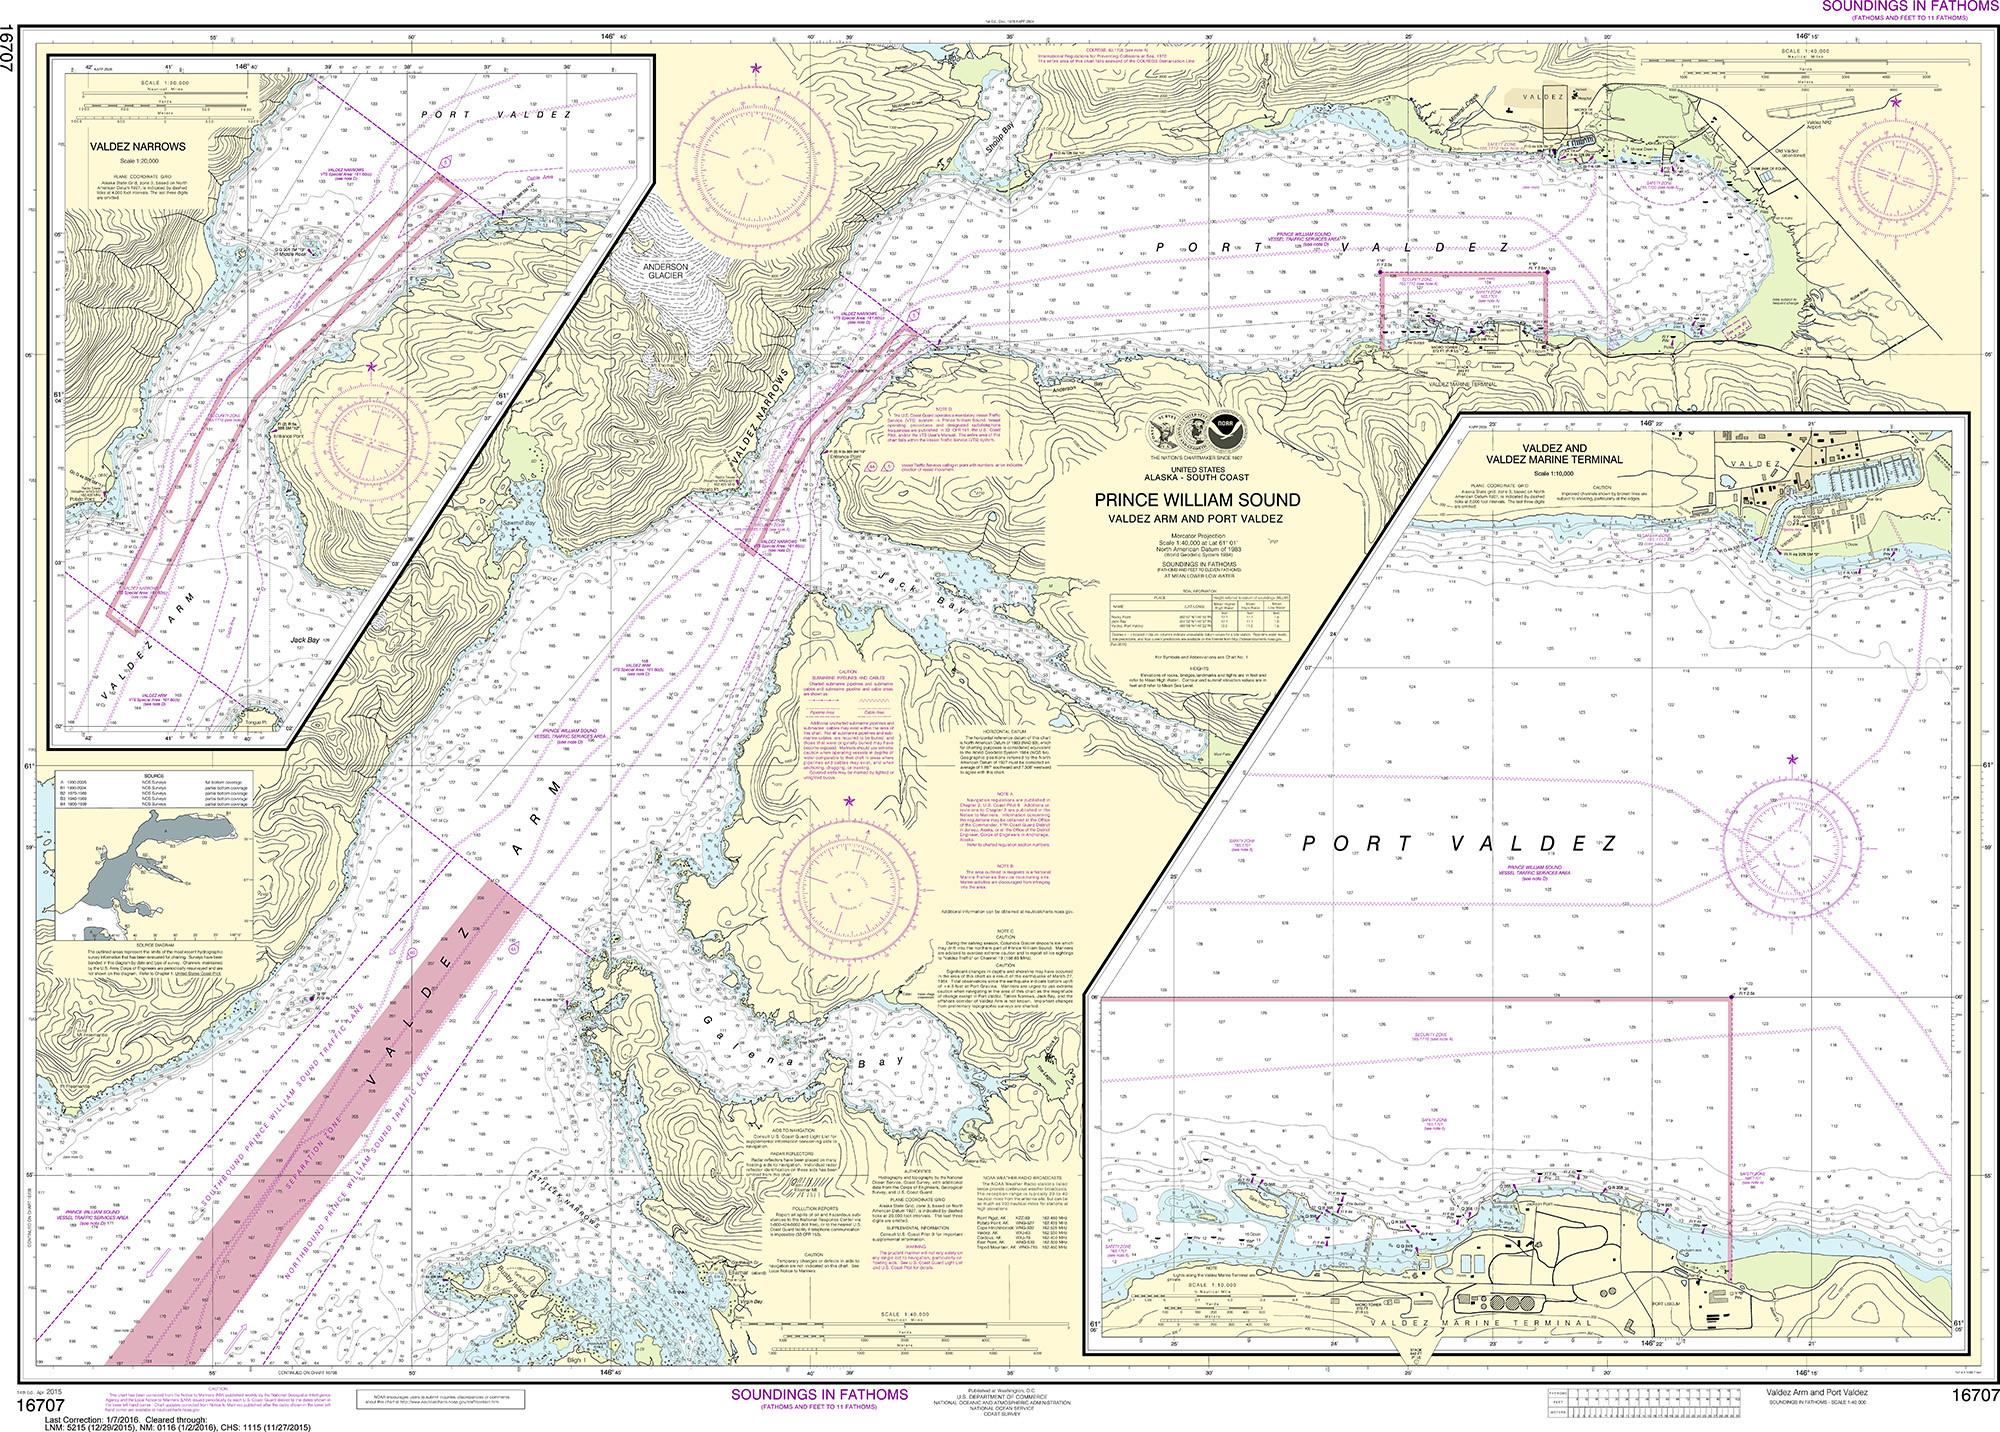 Noaa Nautical Chart 16707 Prince William Sound Valdez Arm And Port Narrows Marine Terminal